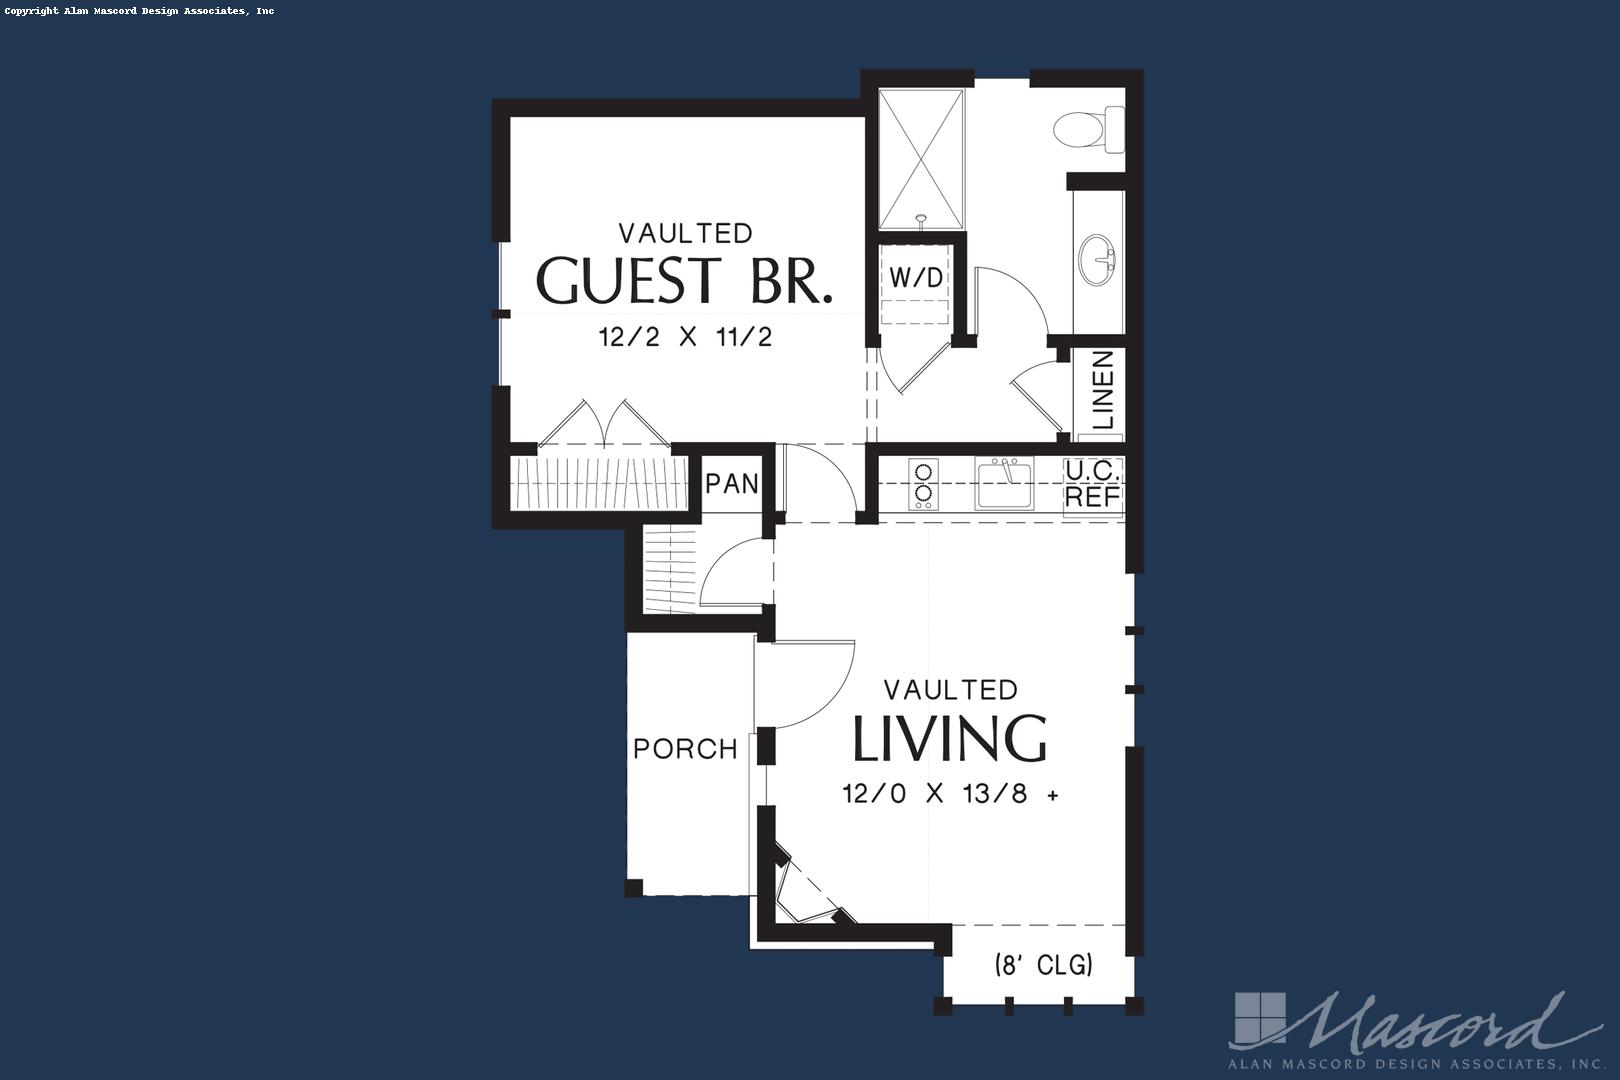 European House Plan 1173 The Mirkwood 544 Sqft 1 Beds 1